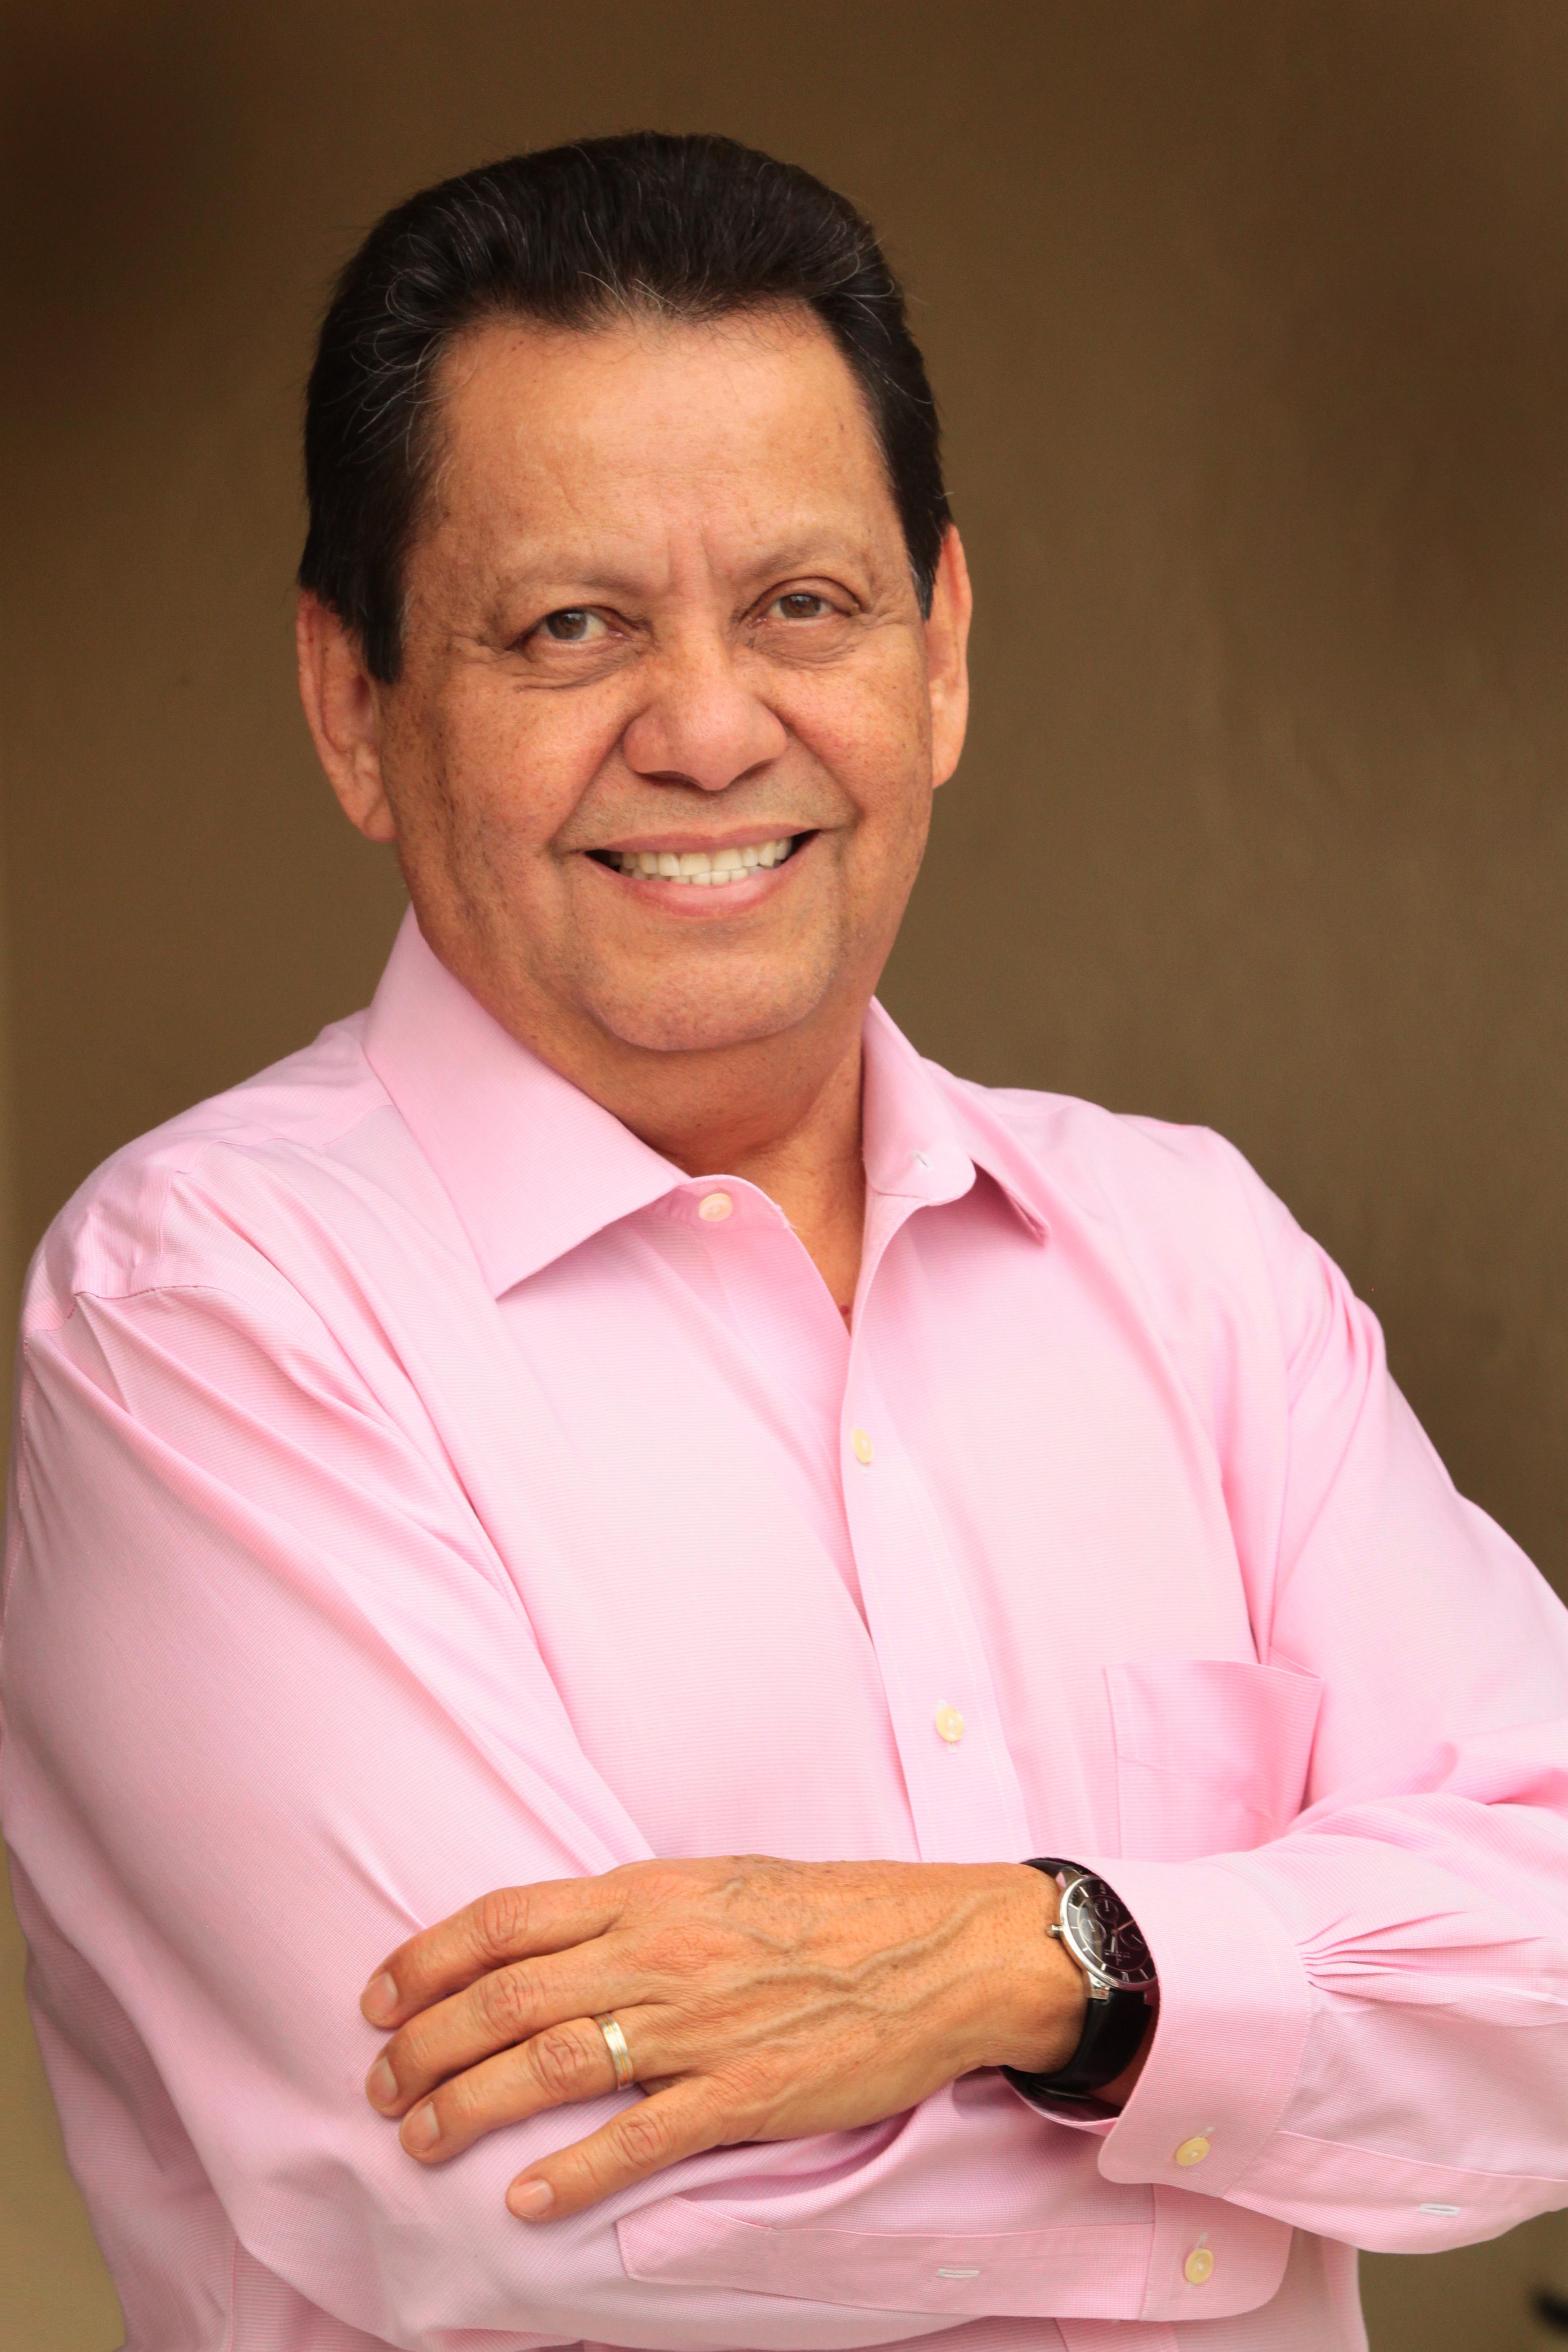 René Fonseca